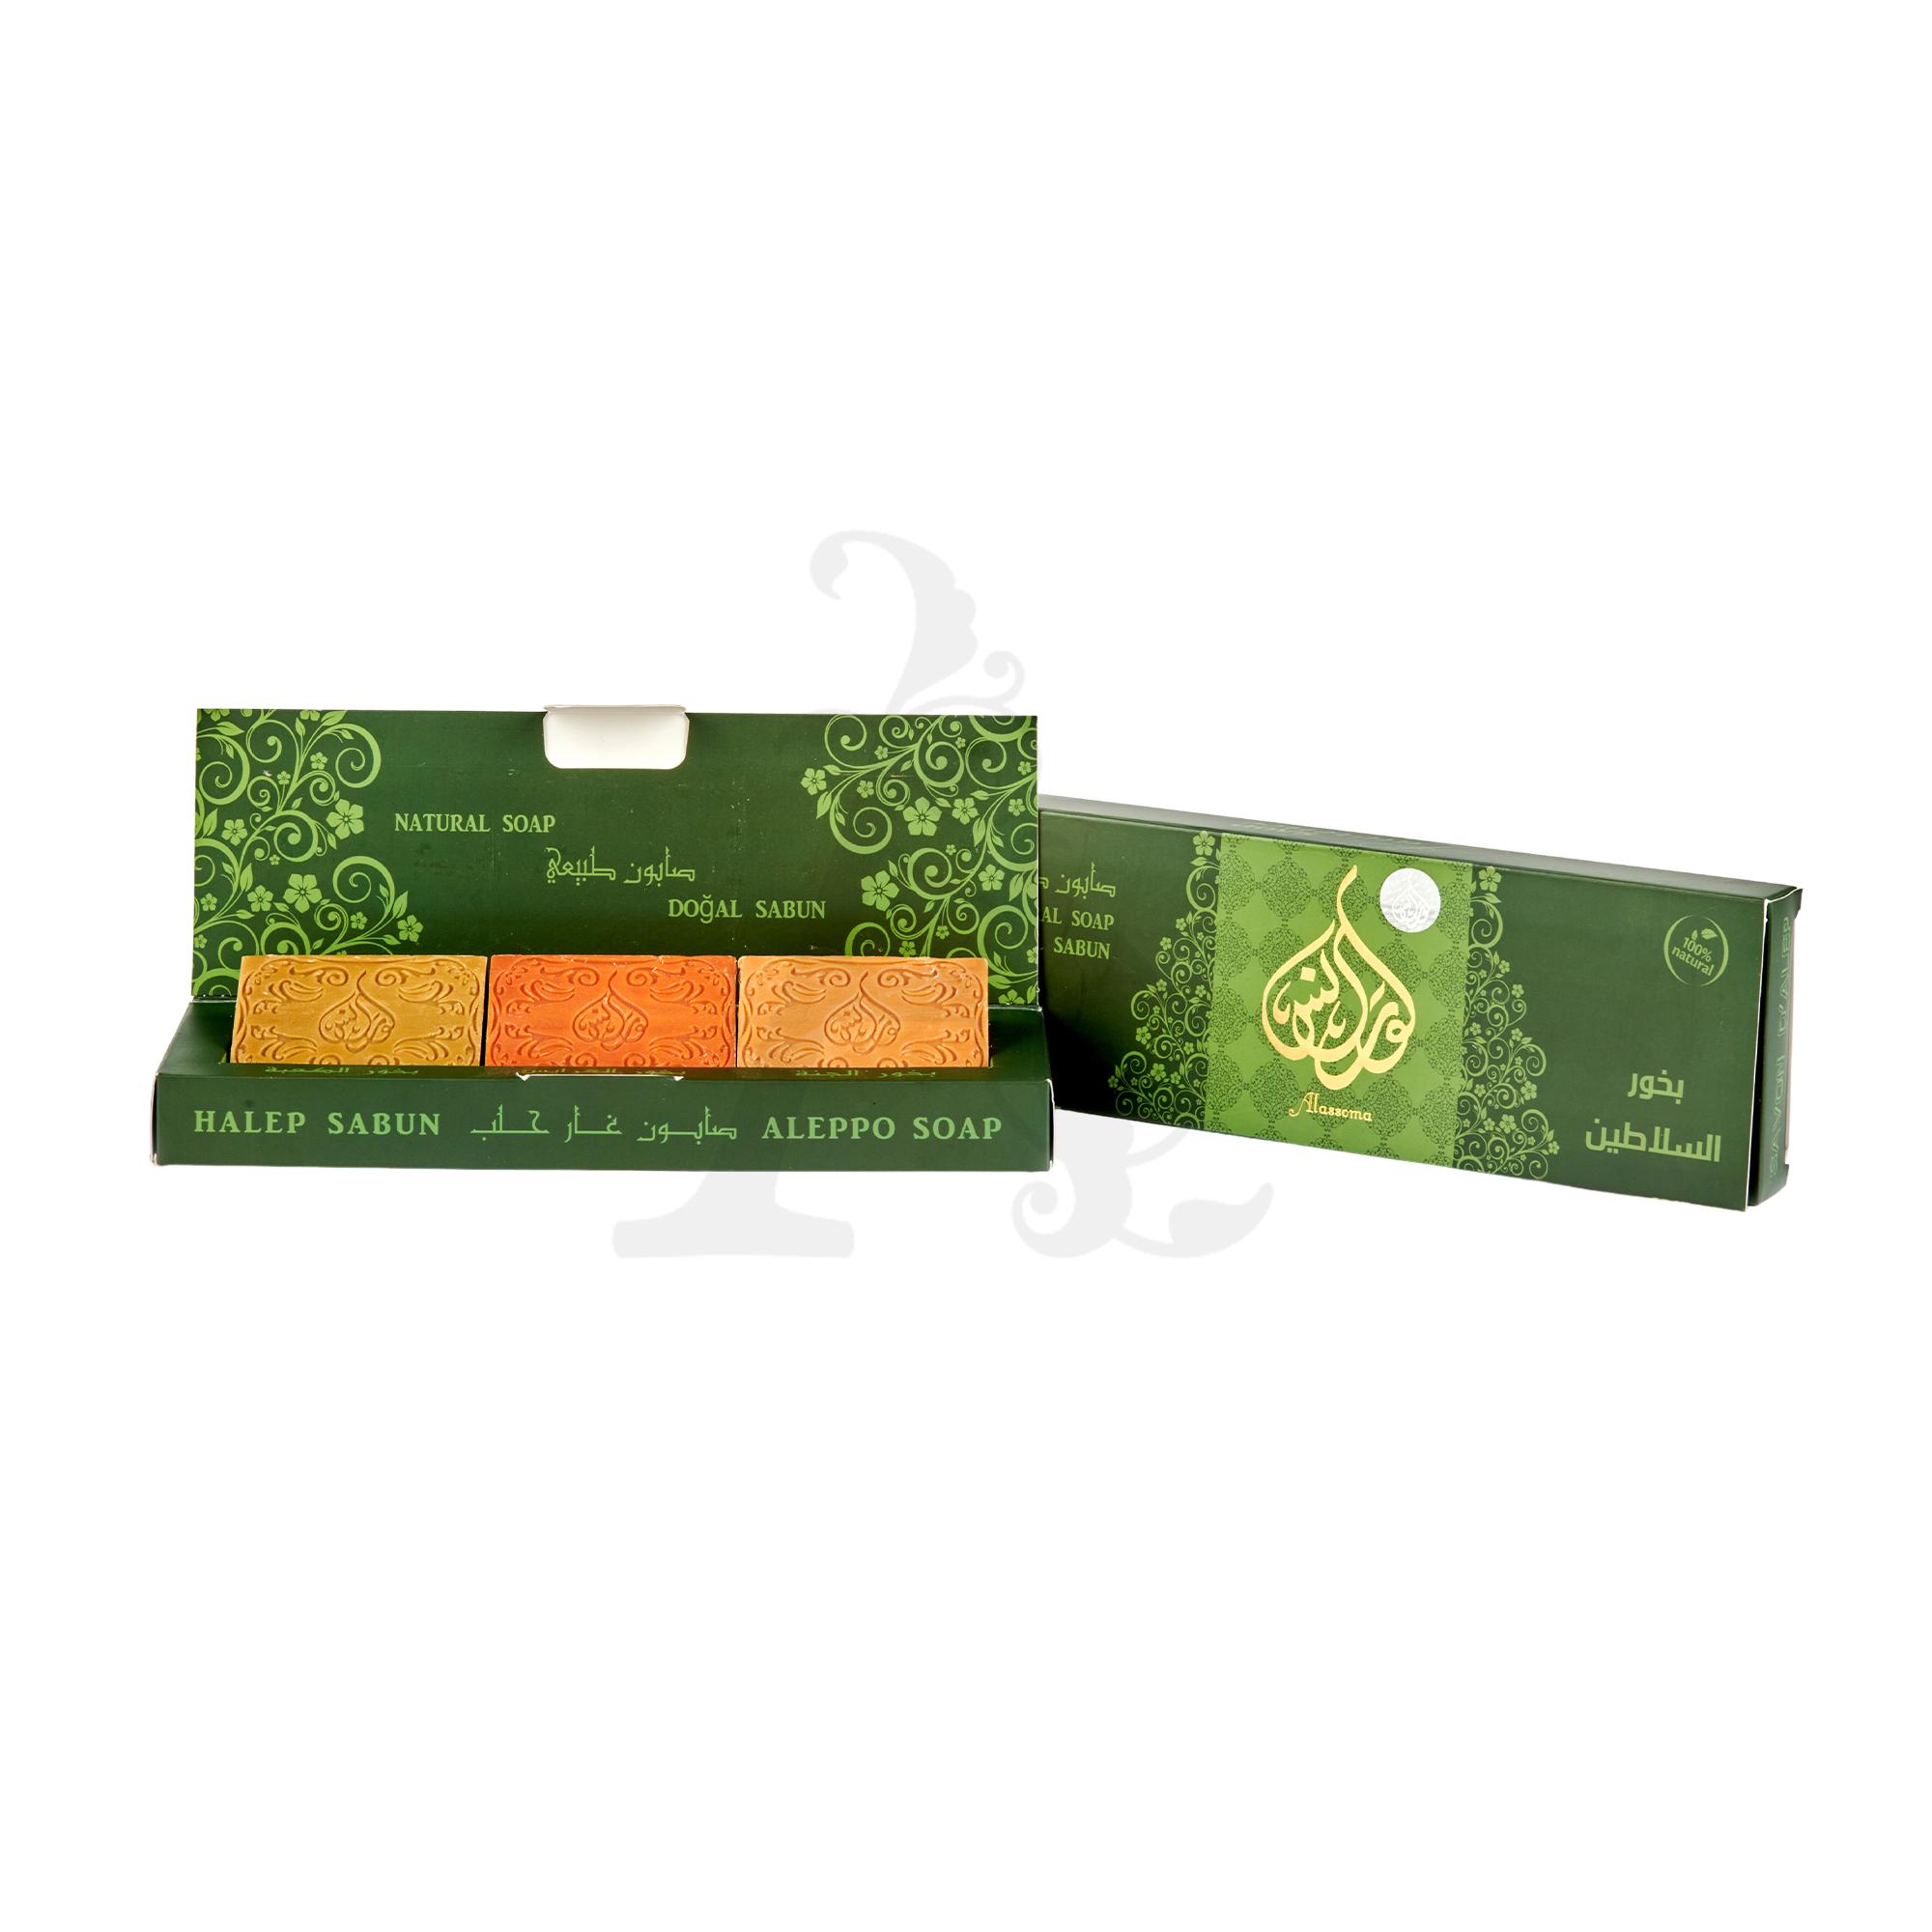 Buy Alassoma Natural Soap Set - Green